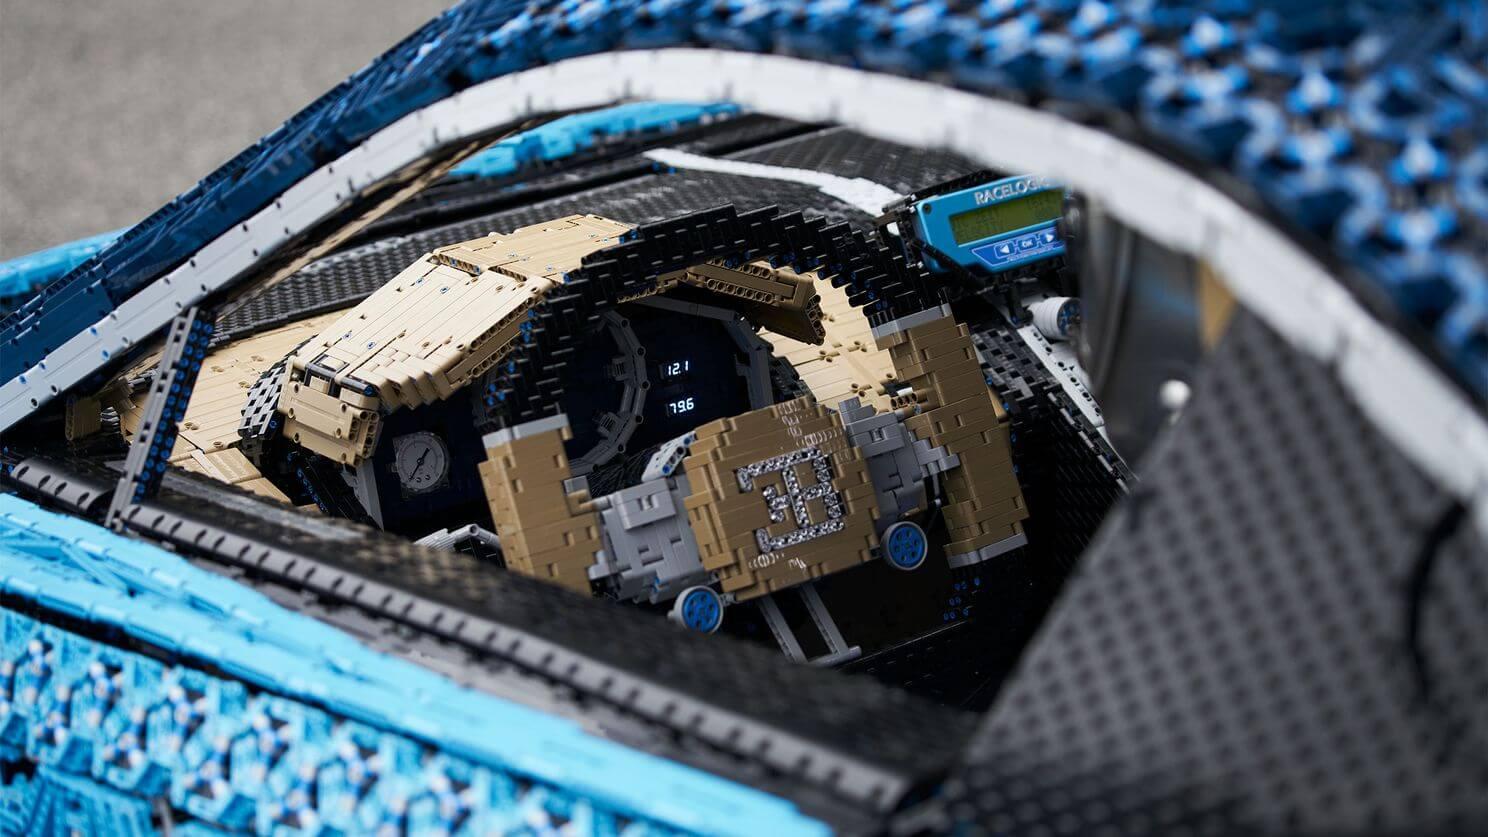 Lego Built A Life-Size Drivable Lego Technic Bugatti